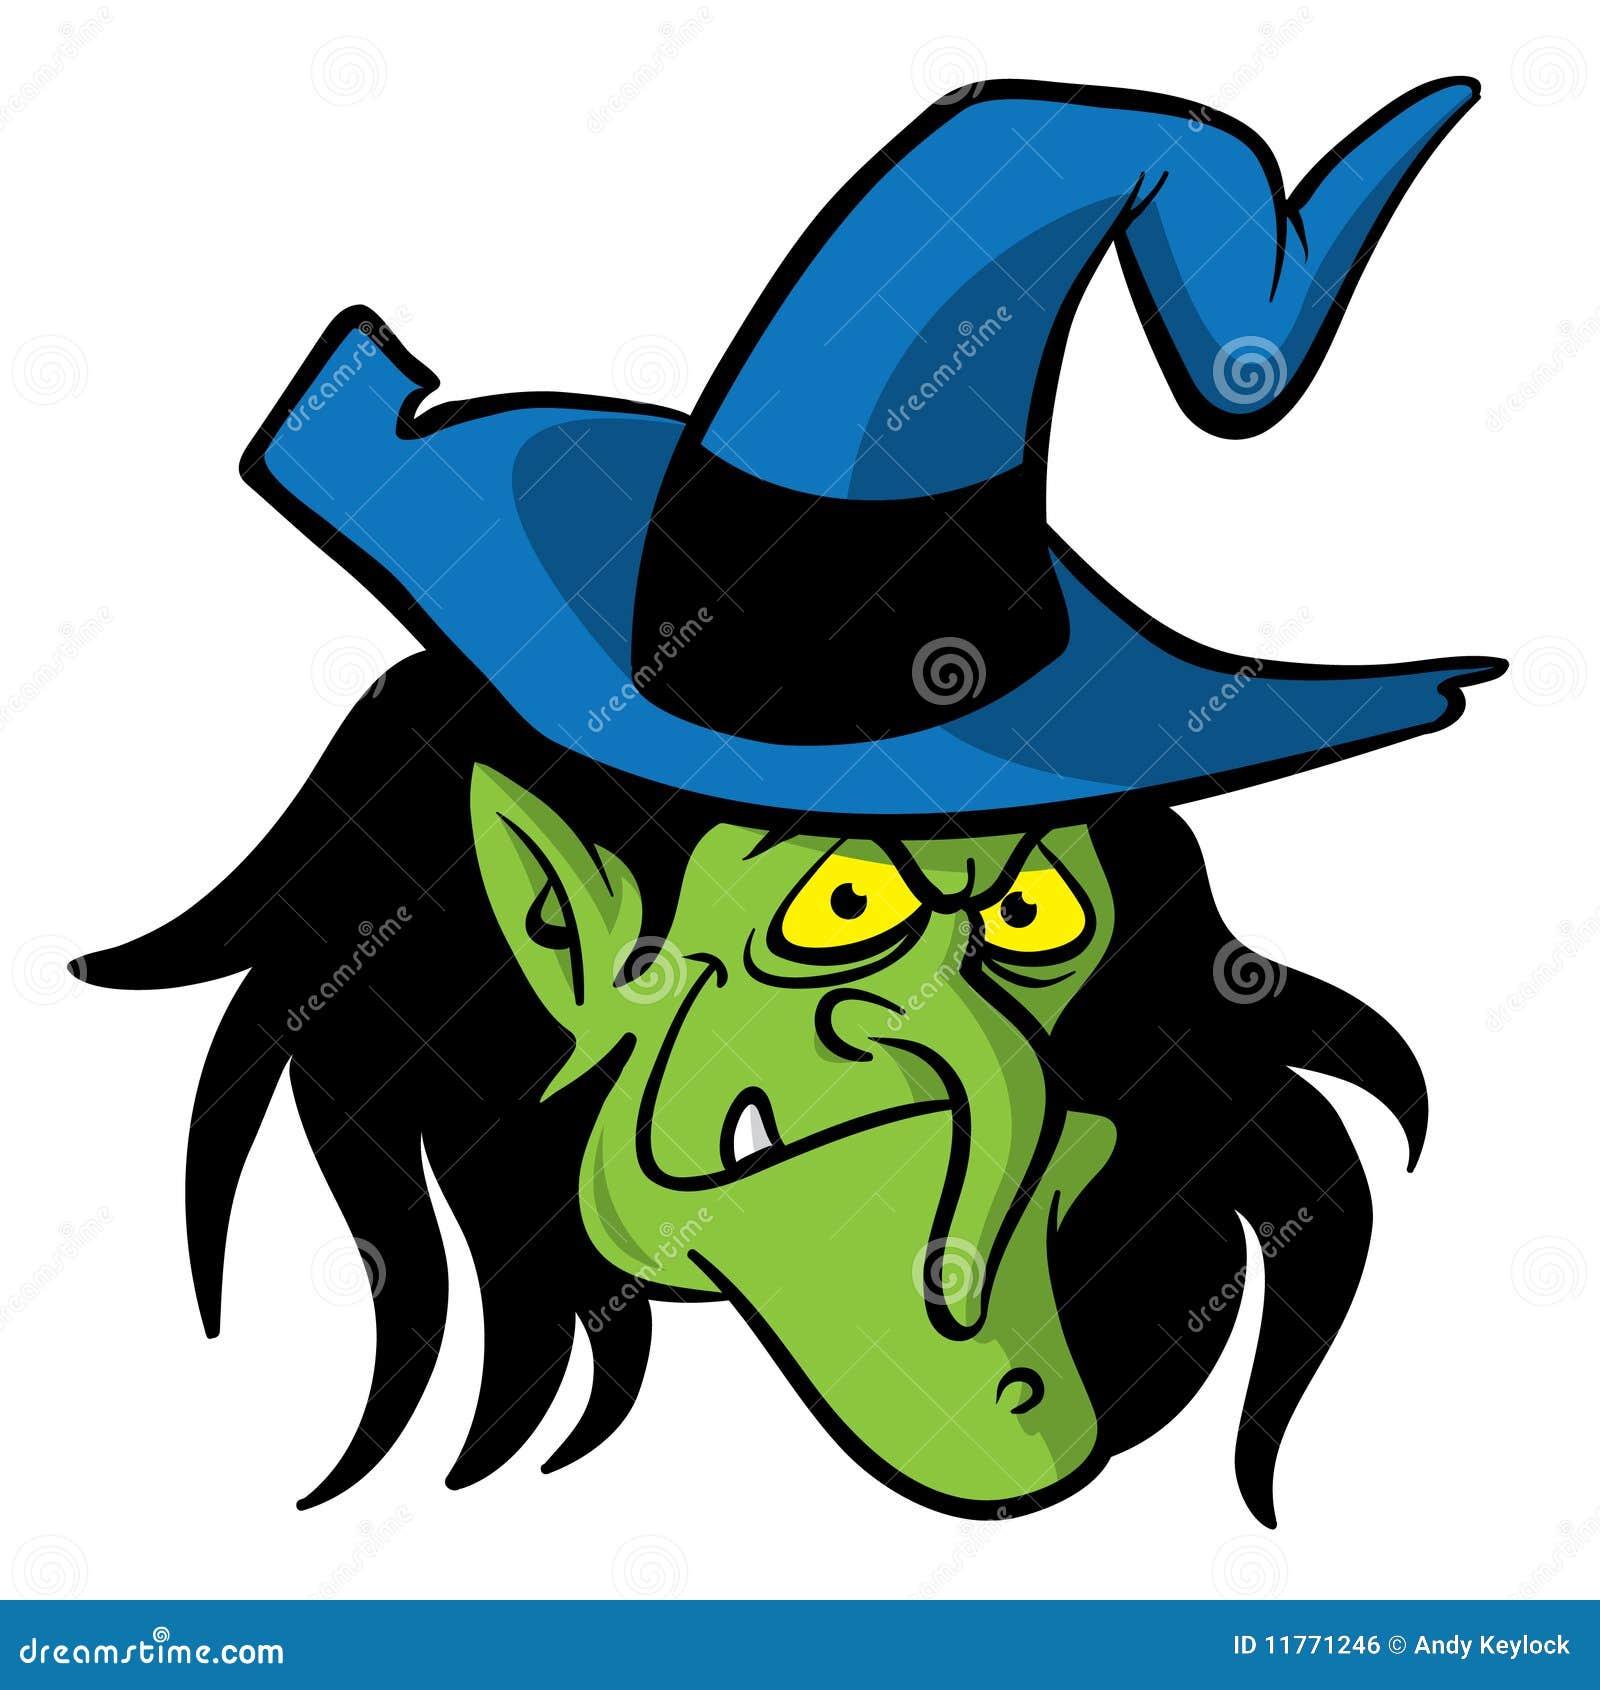 ... Head Cartoon Illustration Royalty Free Stock Image - Image: 11771246